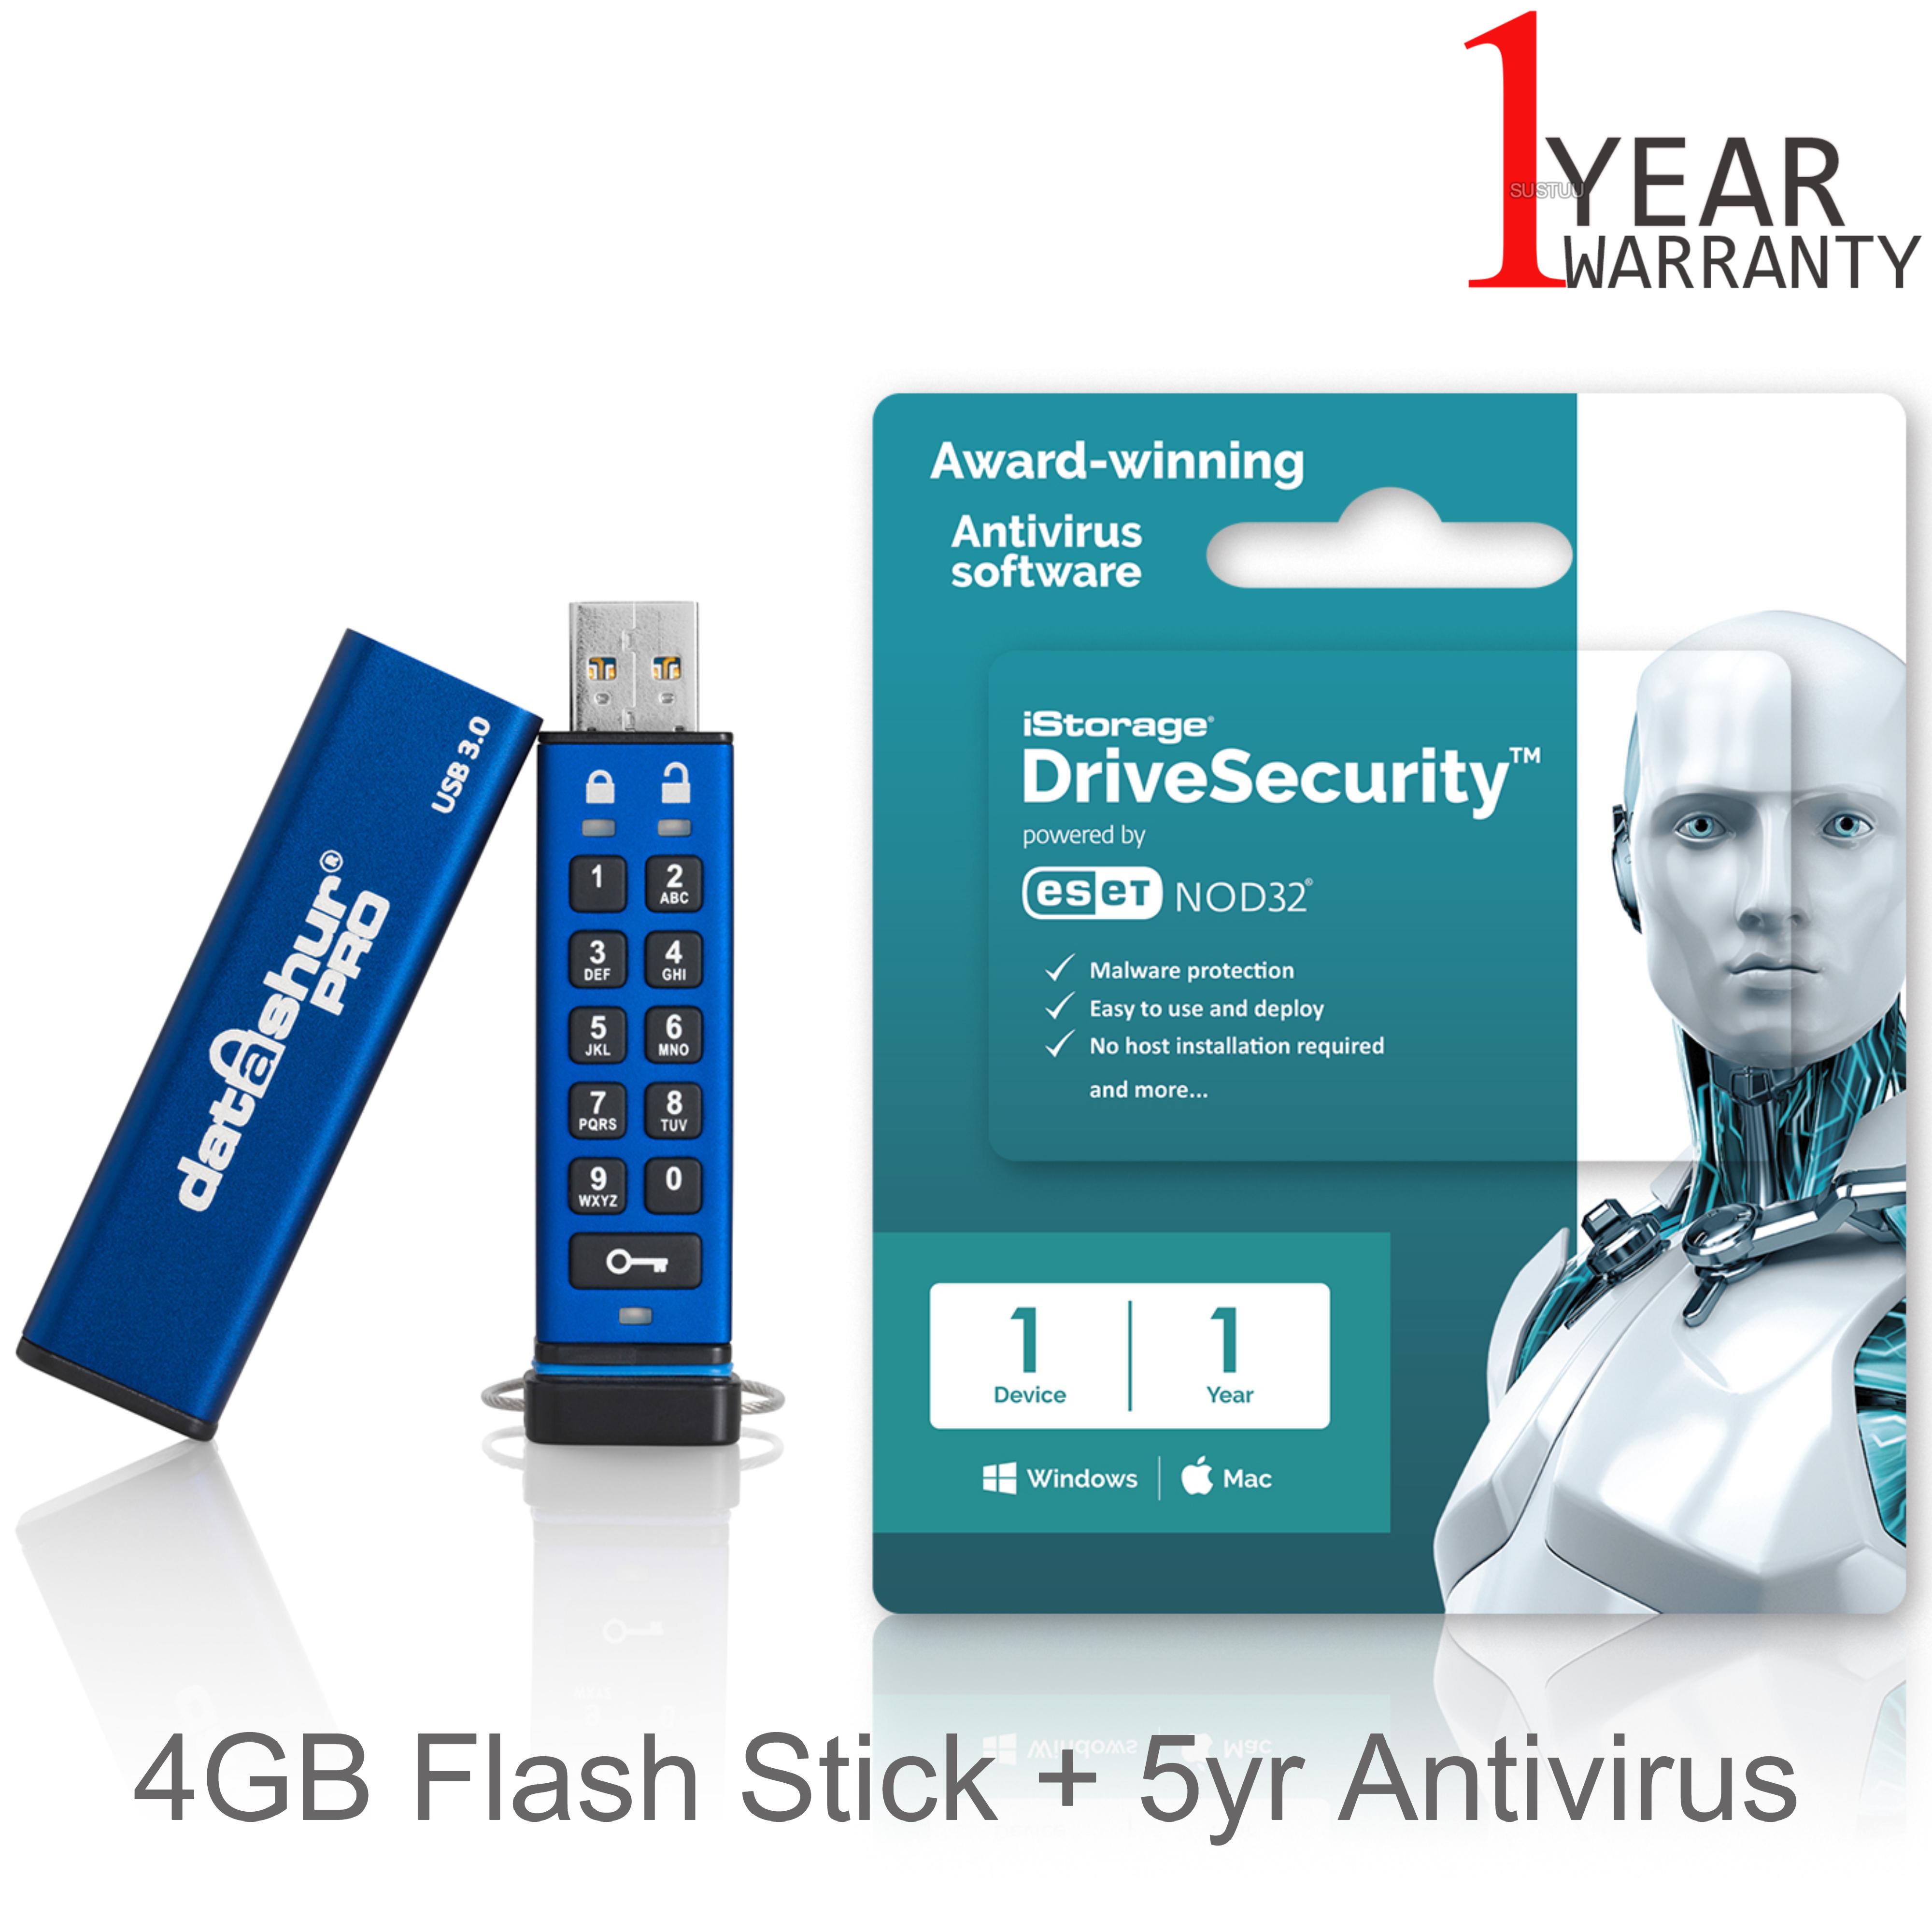 iStorage datAshur Pro 4GB Flash Stick/ Pen Memory Drive + 5yr Antivirus Licence